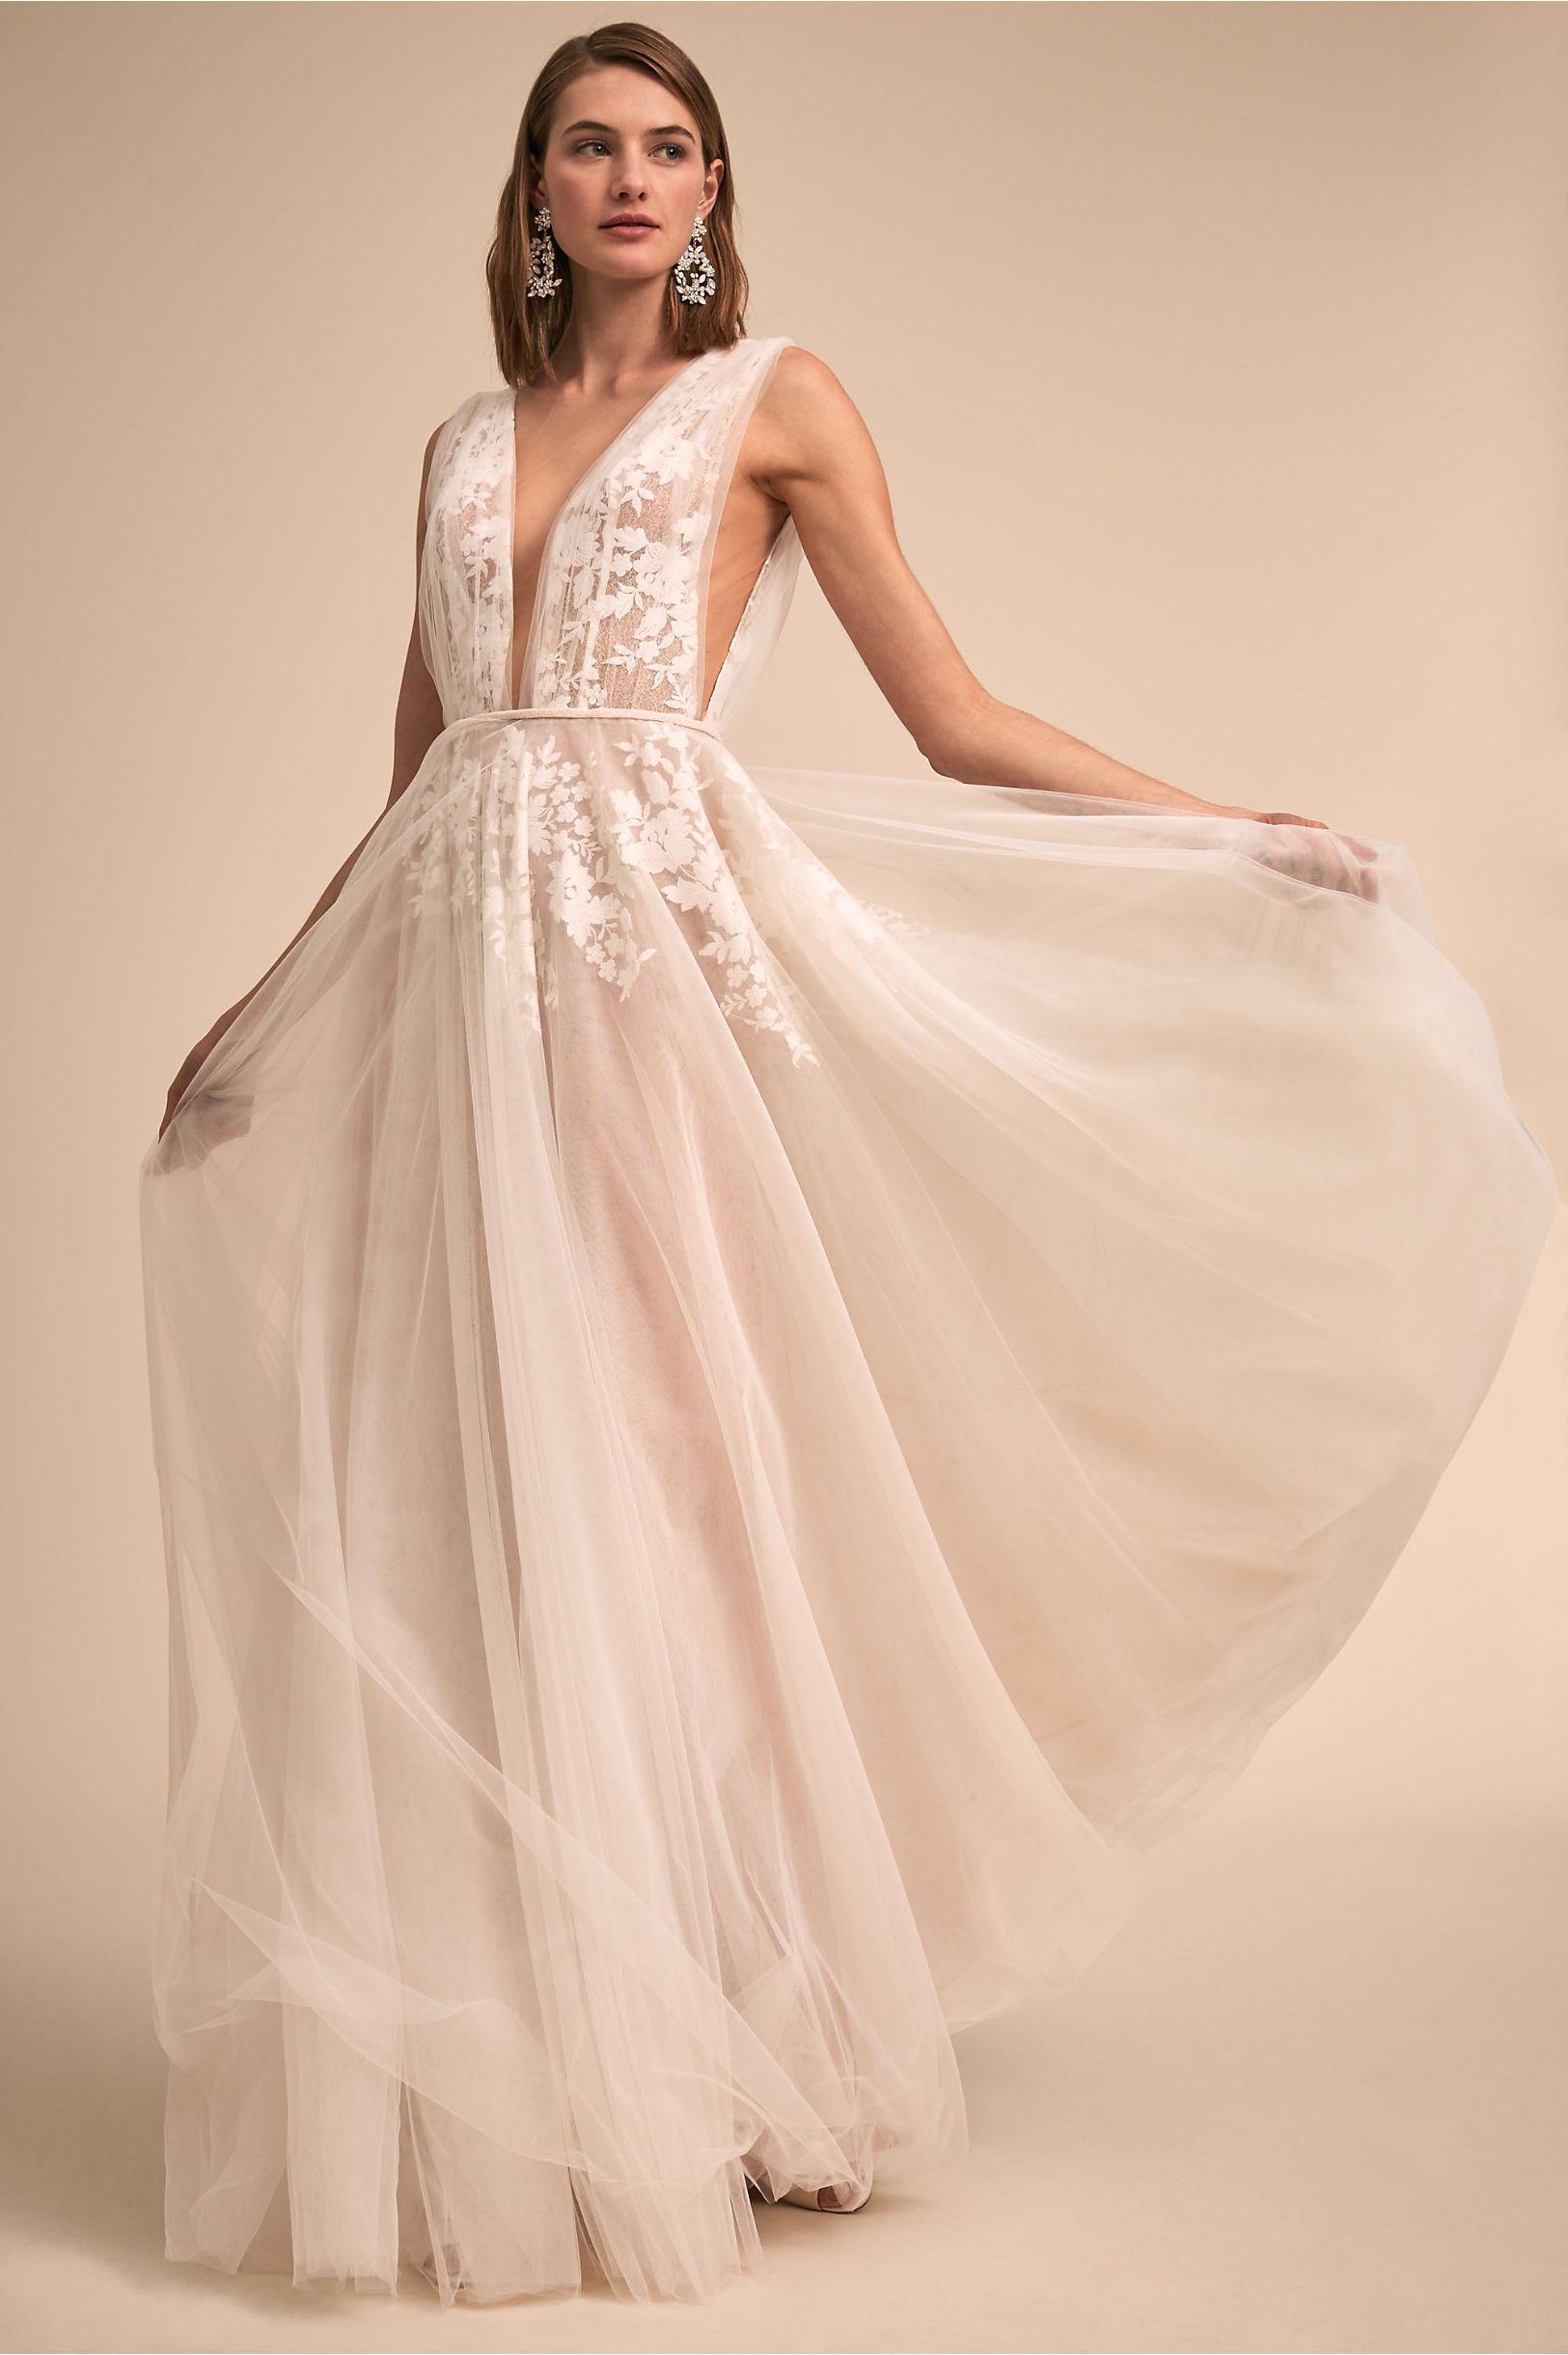 Bhldns Liz Martinez Abilene Gown In Ivory Products Wedding